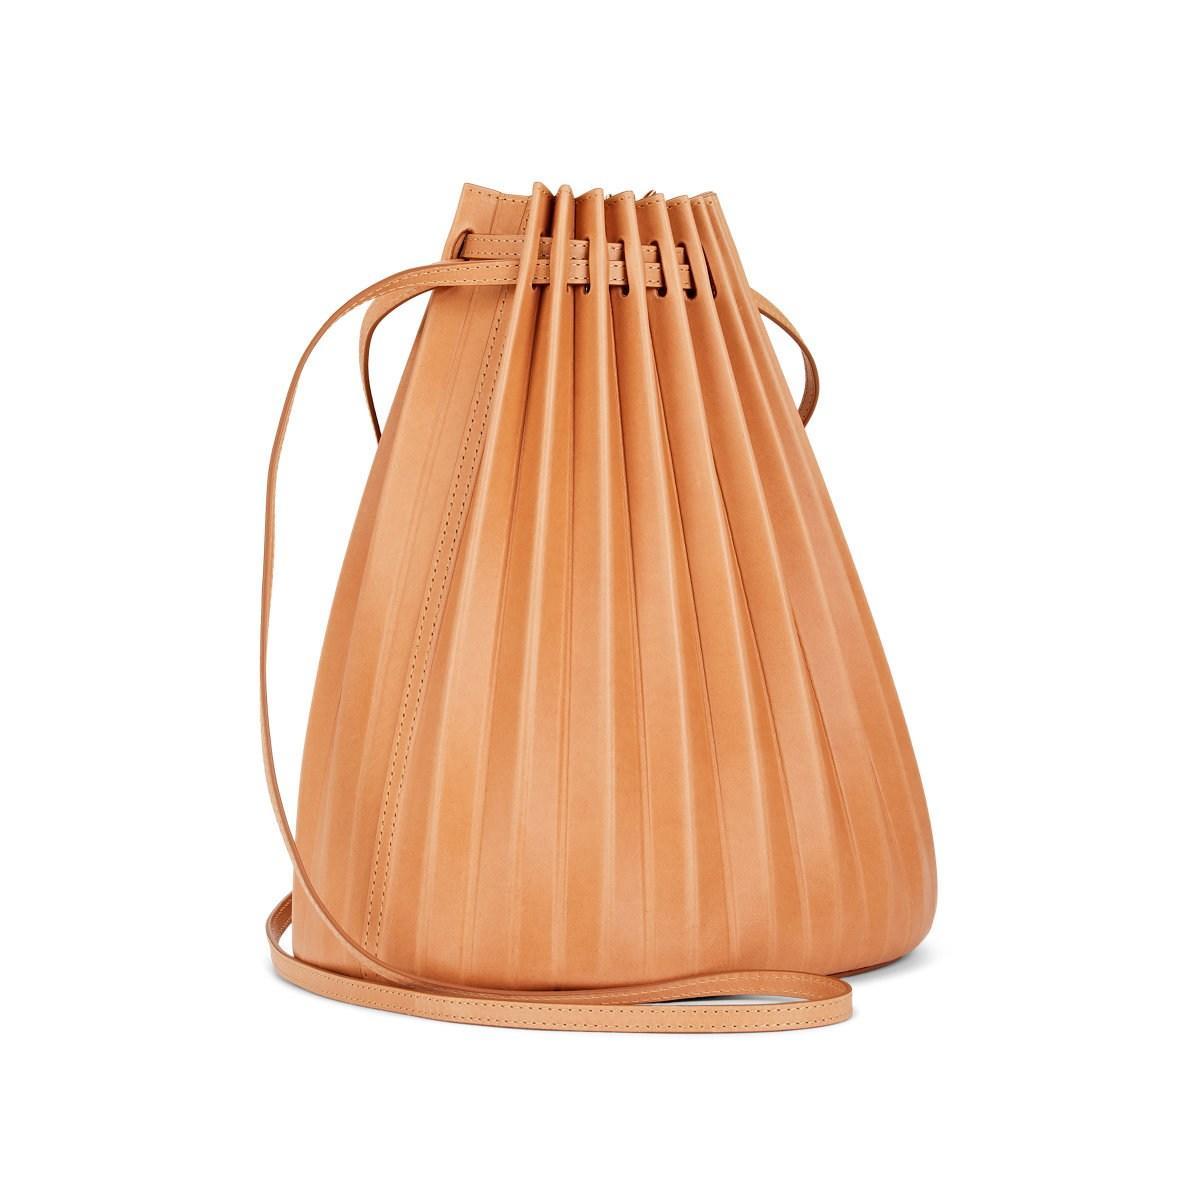 b8dede22f Mansur Gavriel - Natural Pleated Leather Bucket Bag - Lyst. View fullscreen